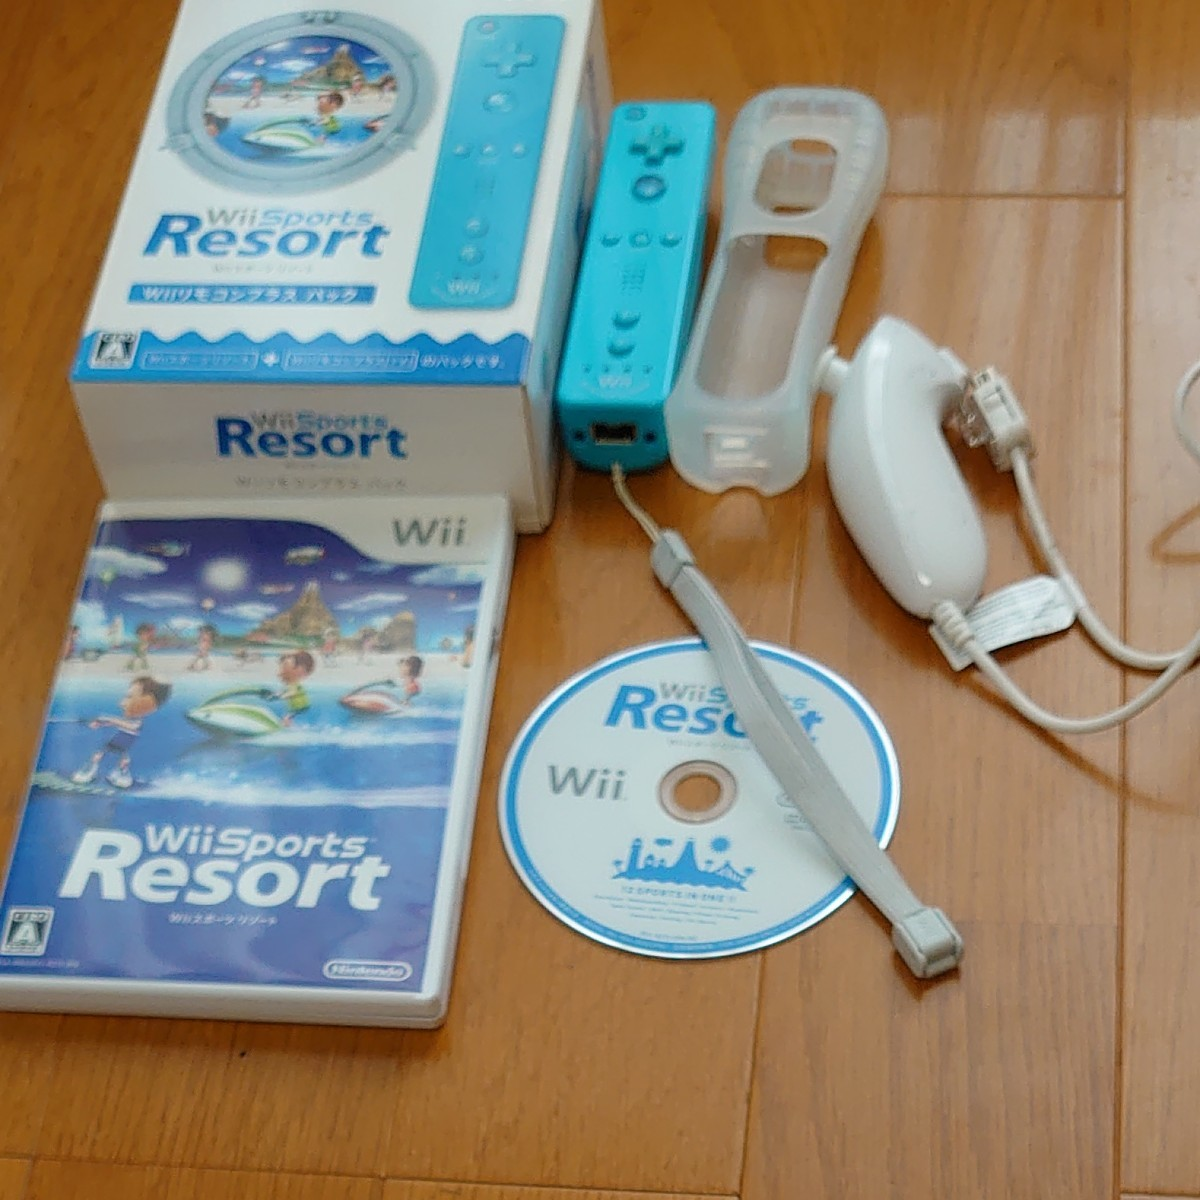 Wii Sports Resort Wiiリモコンプラスパック と ヌンチャクセット Wiiスポーツリゾート 任天堂Wii